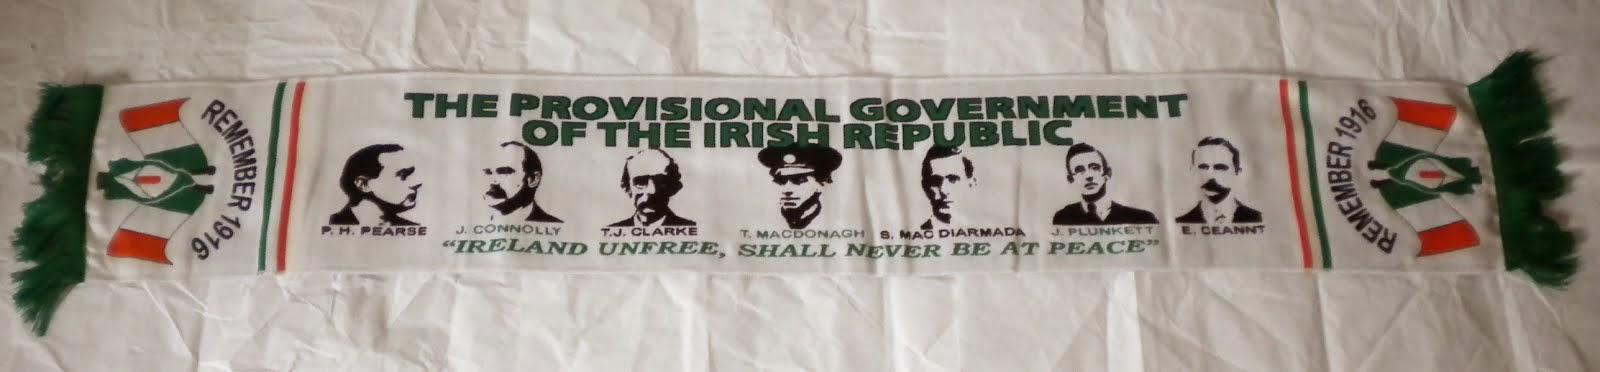 Bufanda Provisional Government - Irish Republic - 15€